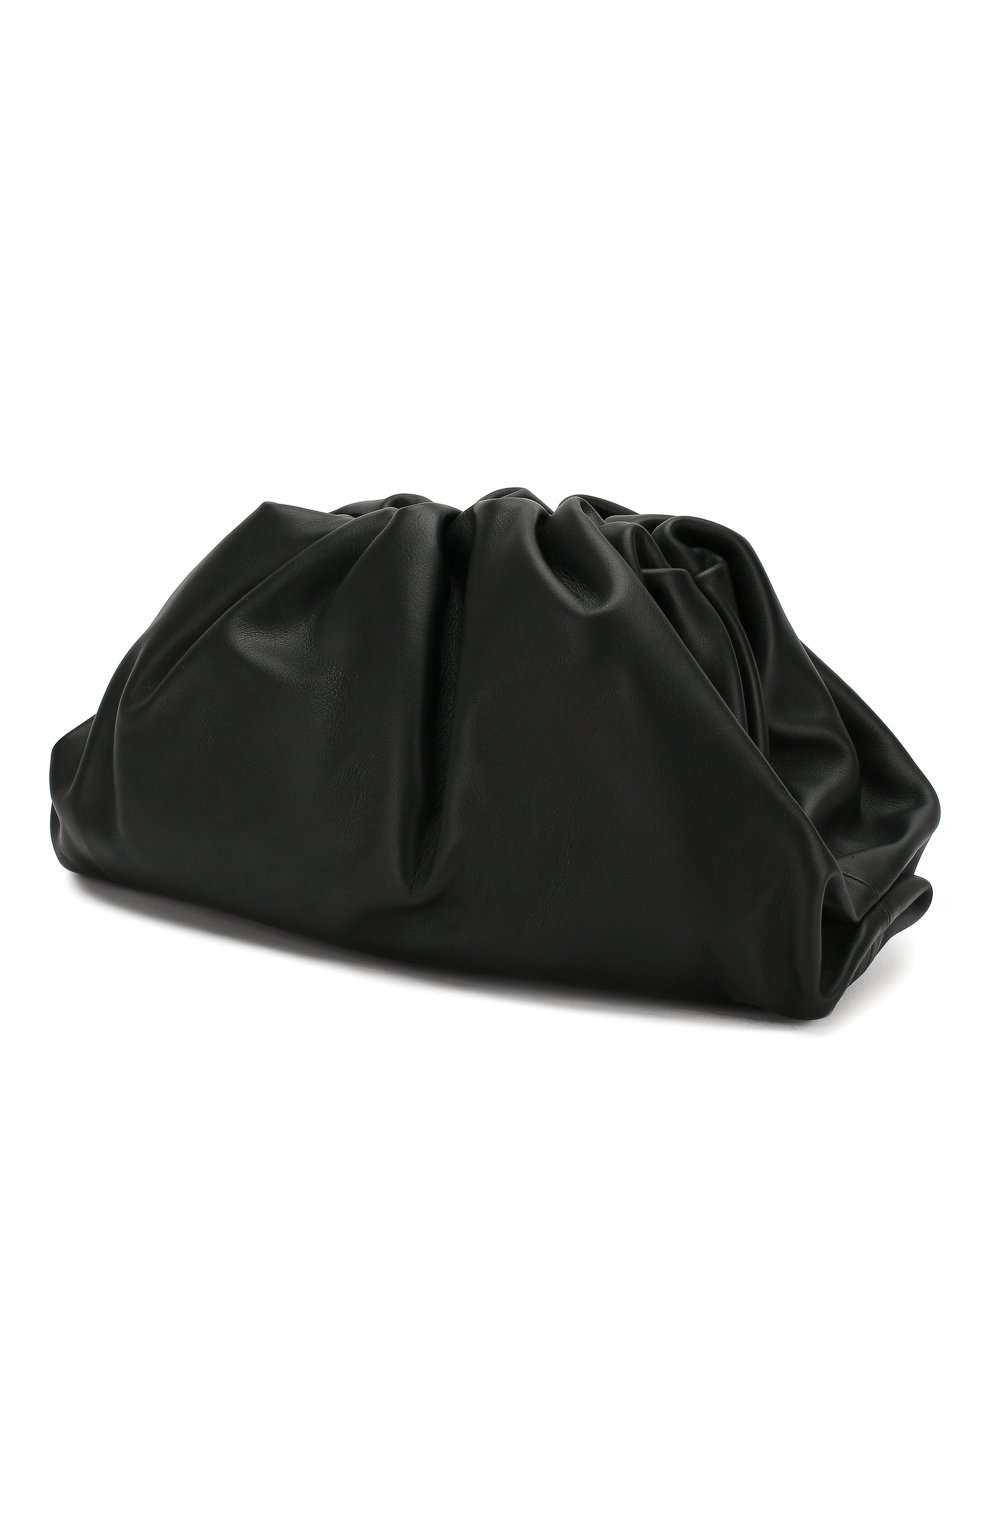 Женский клатч pouch  BOTTEGA VENETA черного цвета, арт. 576227/VBIU5 | Фото 3